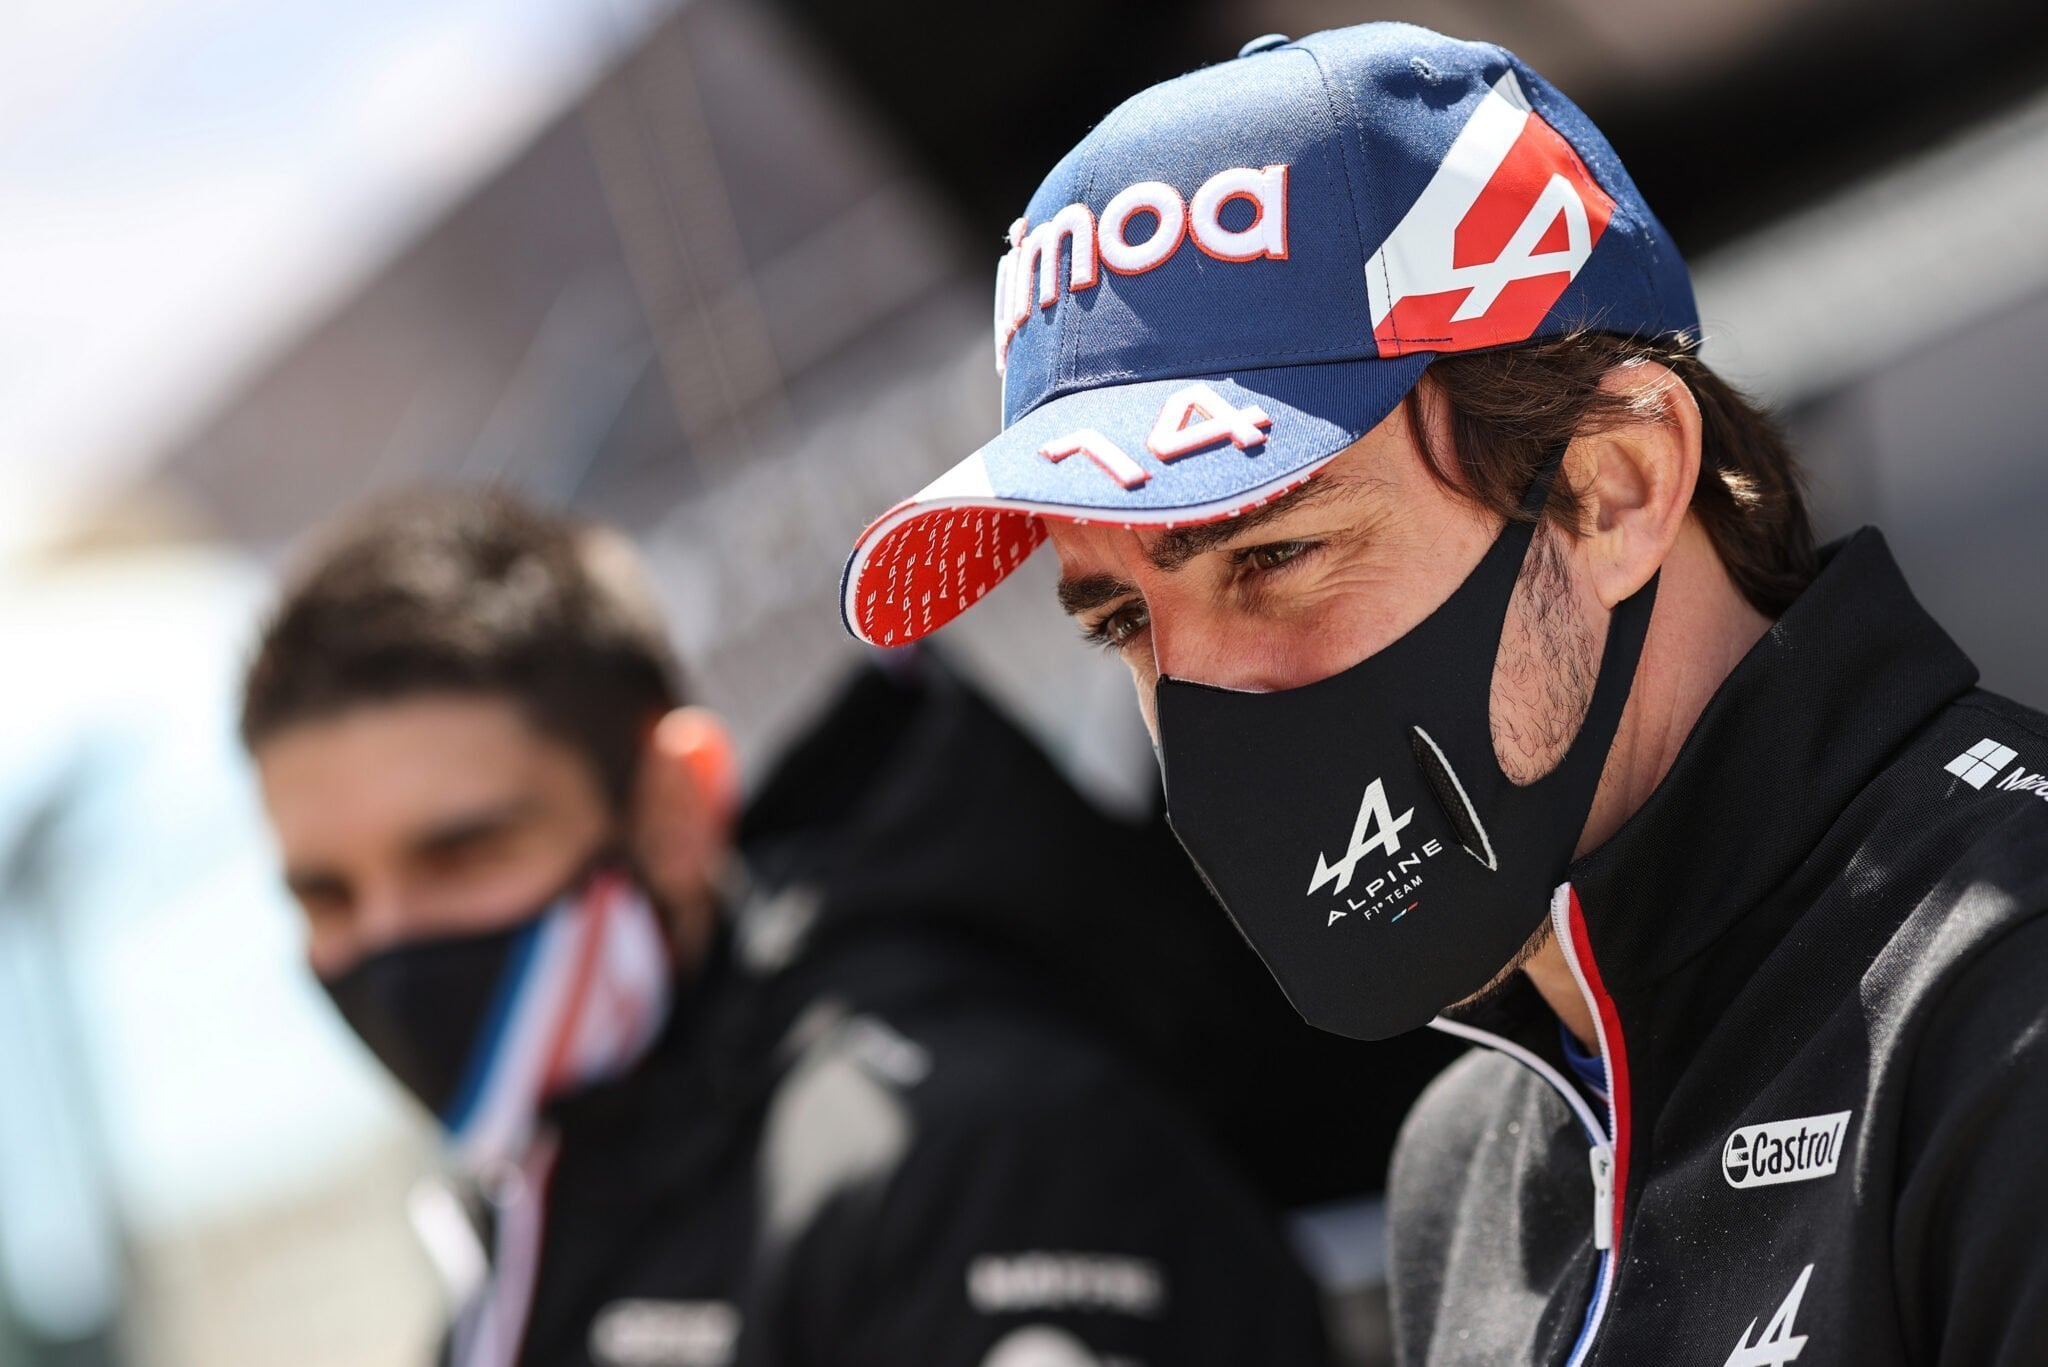 Alpine F1 Team Alonso Ocon A521